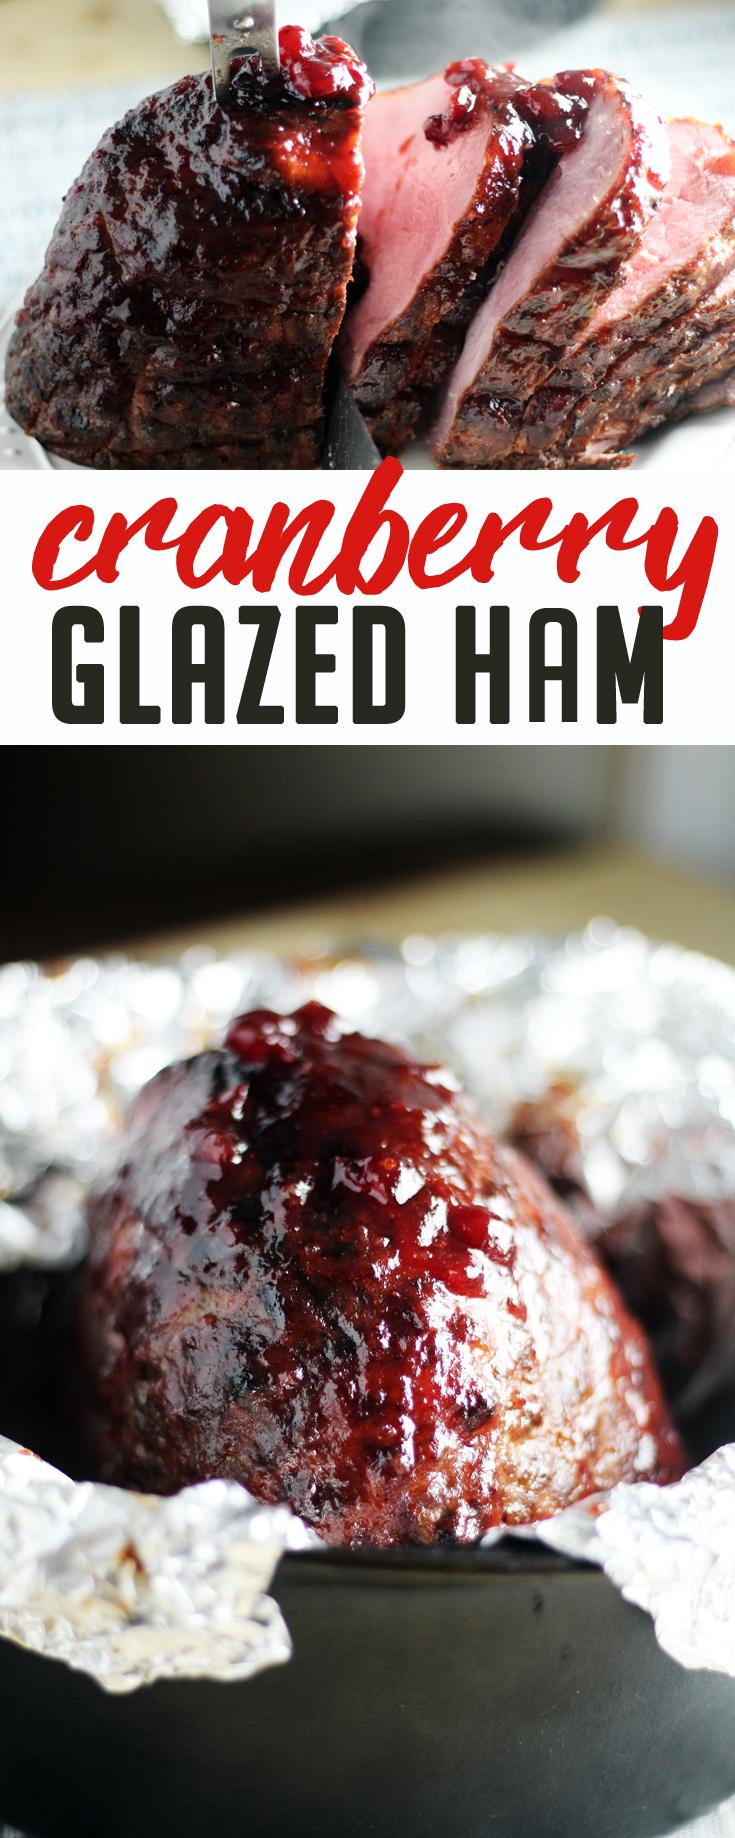 Cranberry Glazed Ham